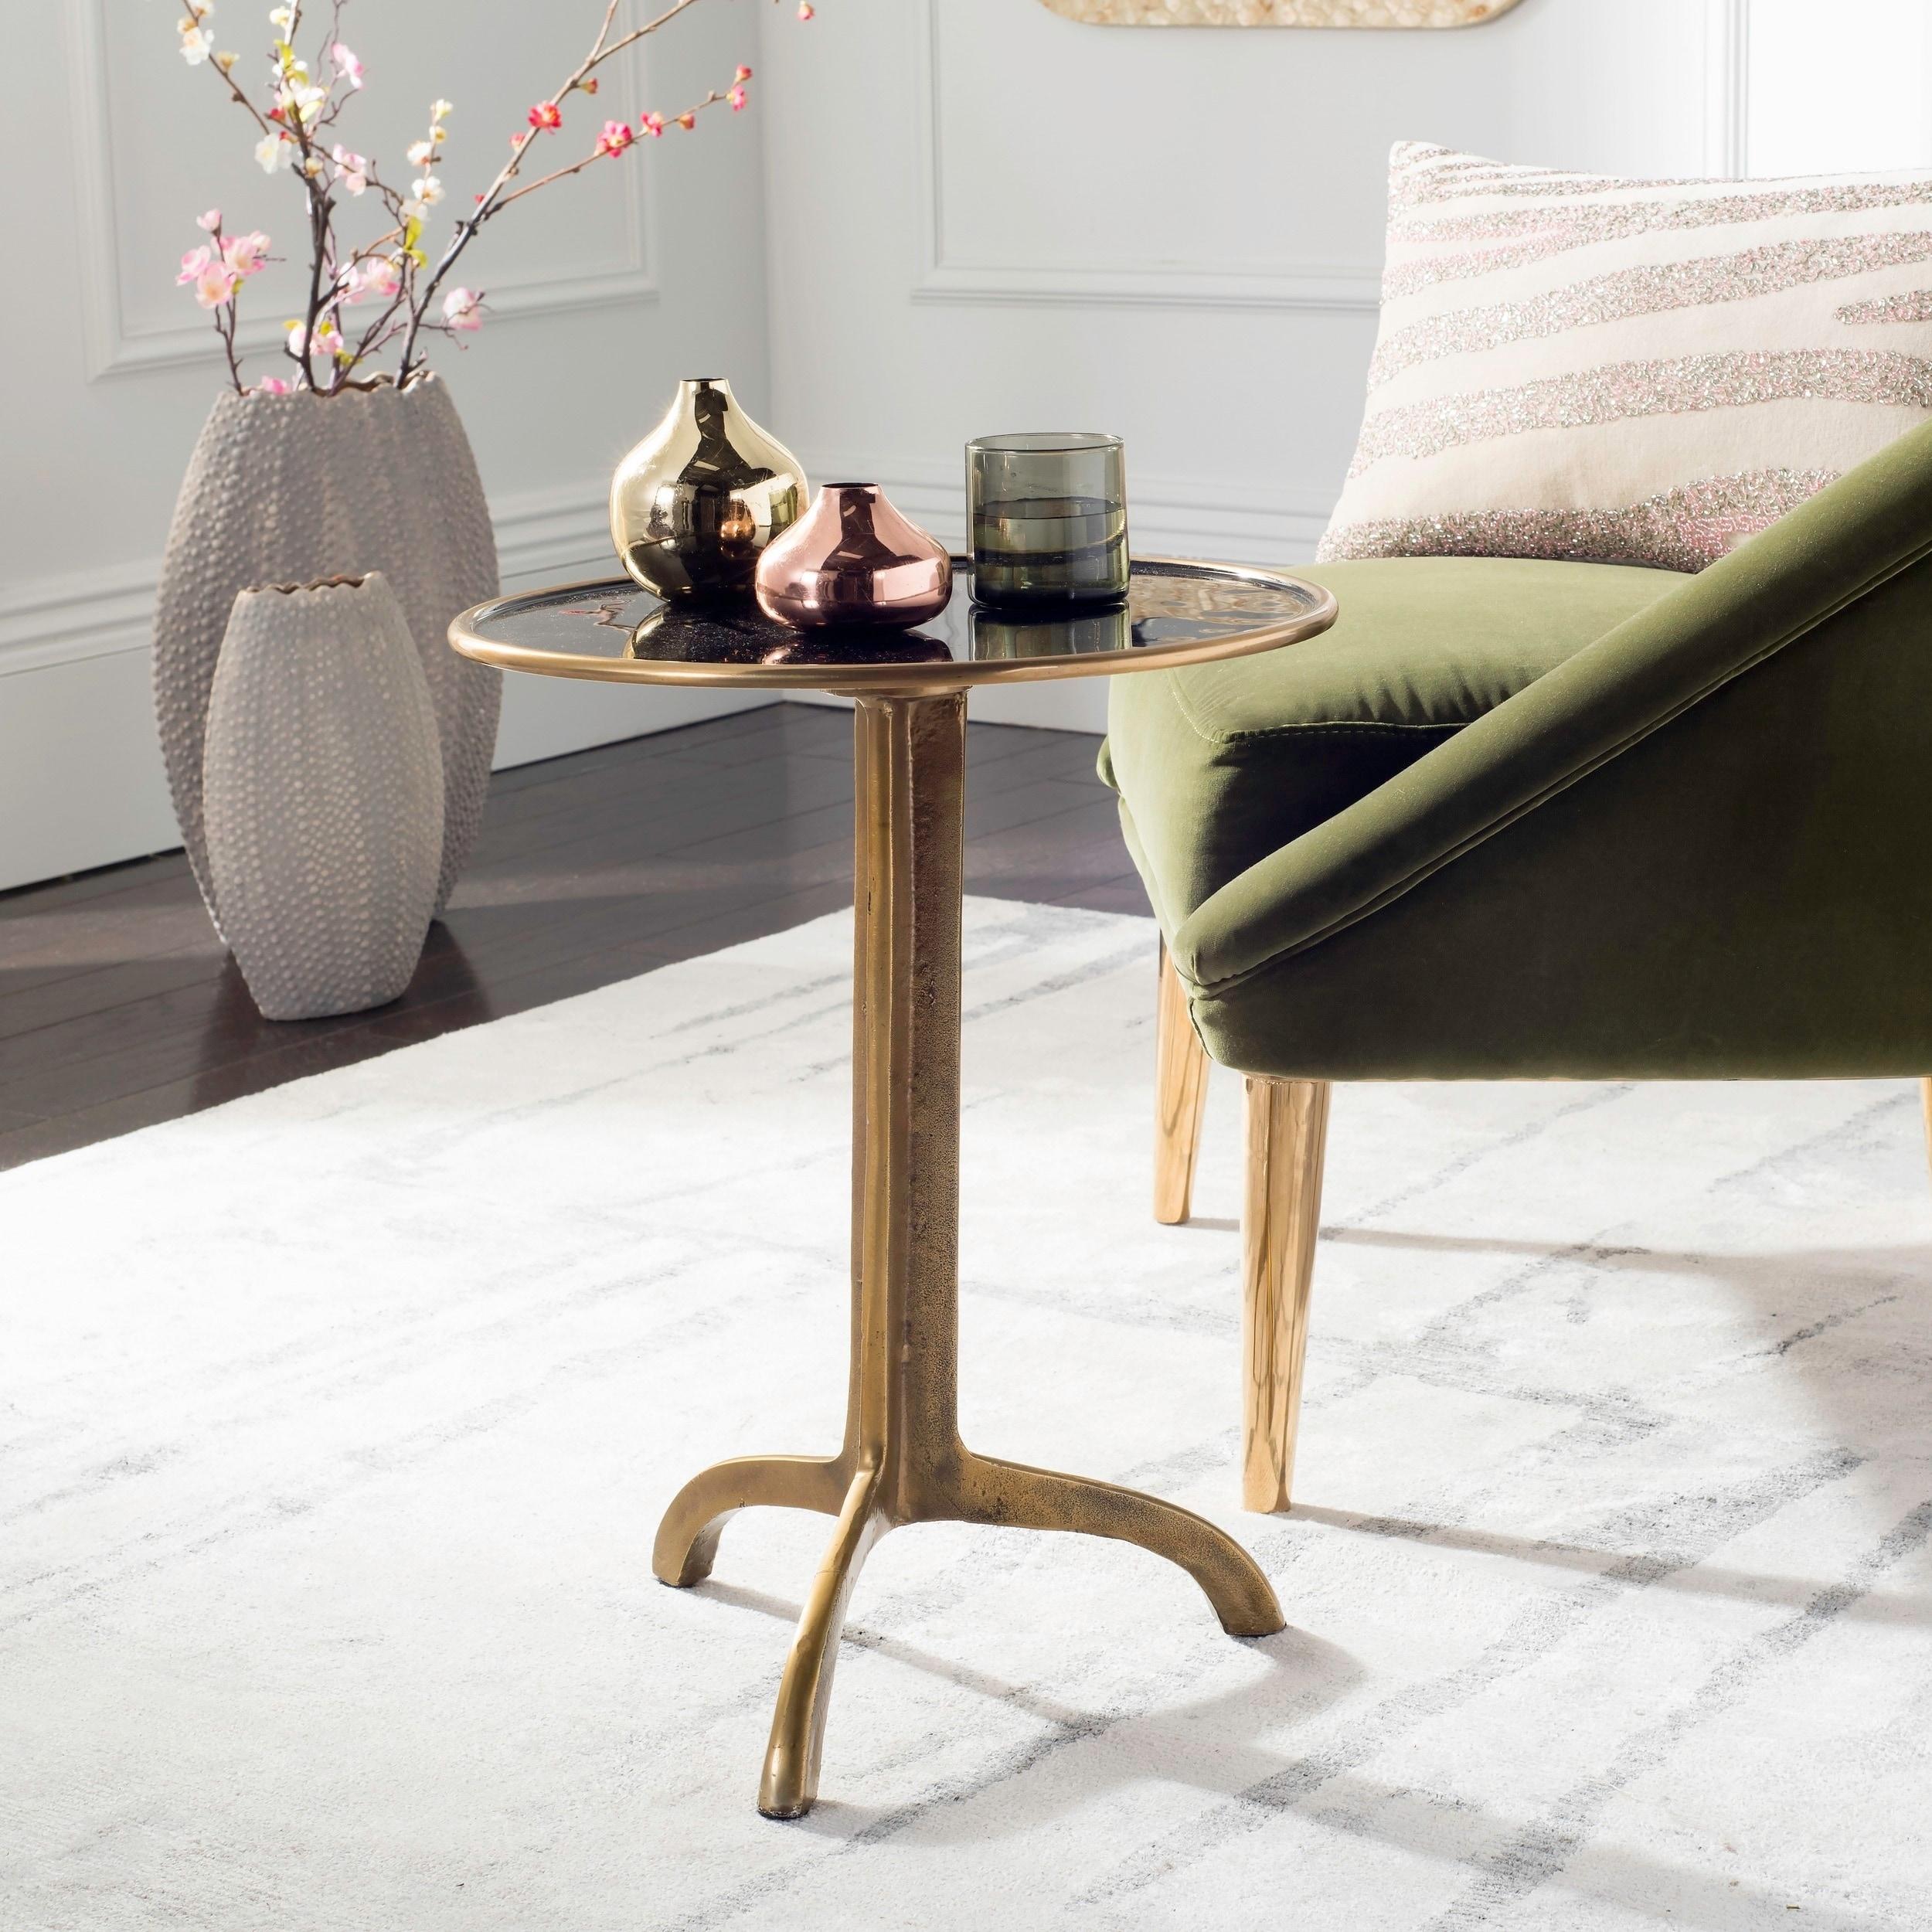 - Shop Safavieh Brent Antique Brass Accent Table - 16